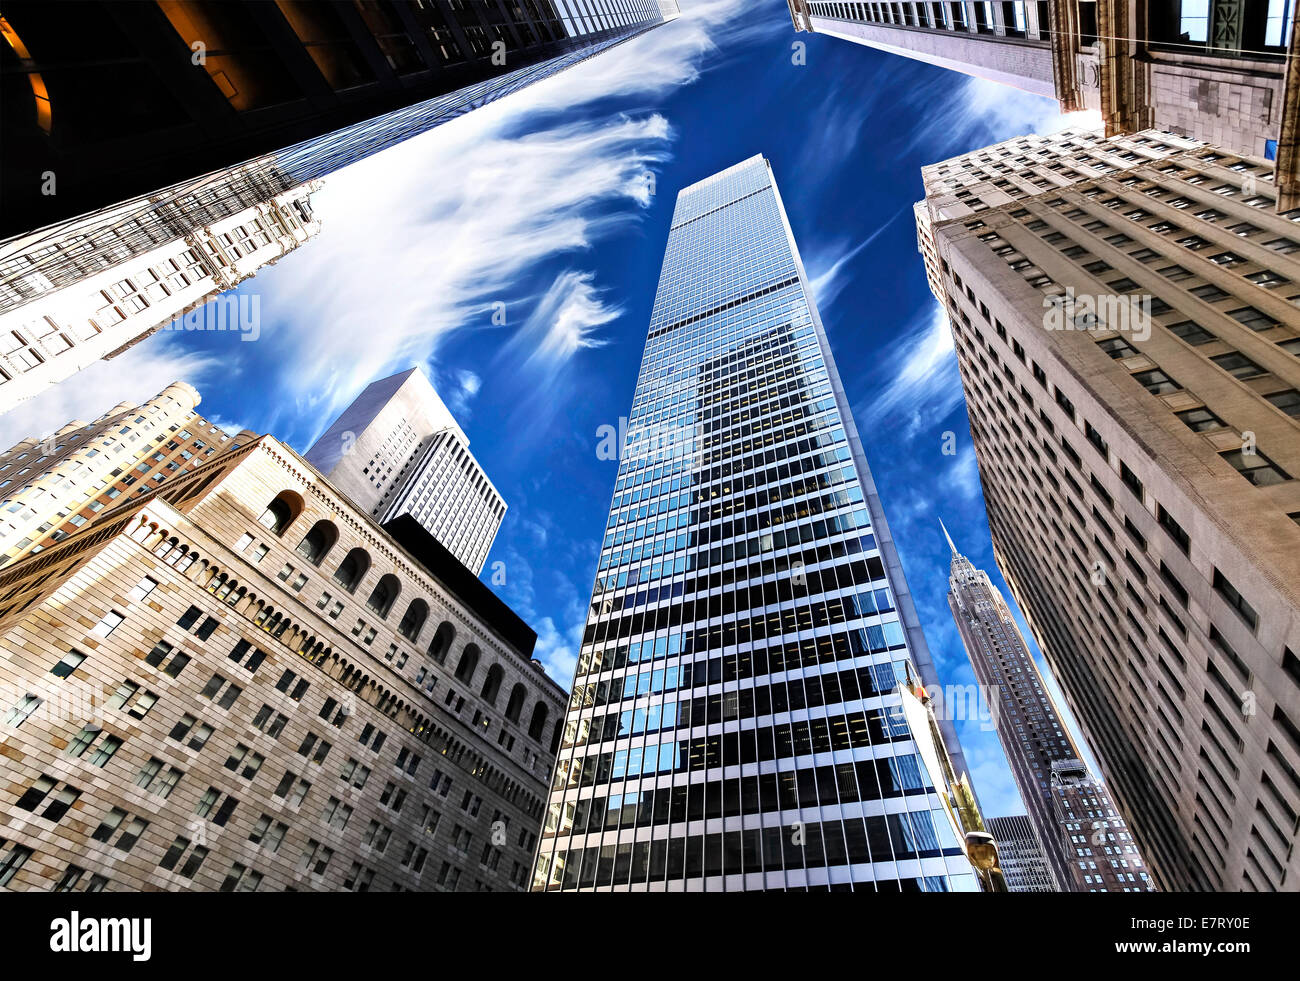 Wolkenkratzer in Lower Manhattan, blickte zu Himmel, New York City. Stockbild